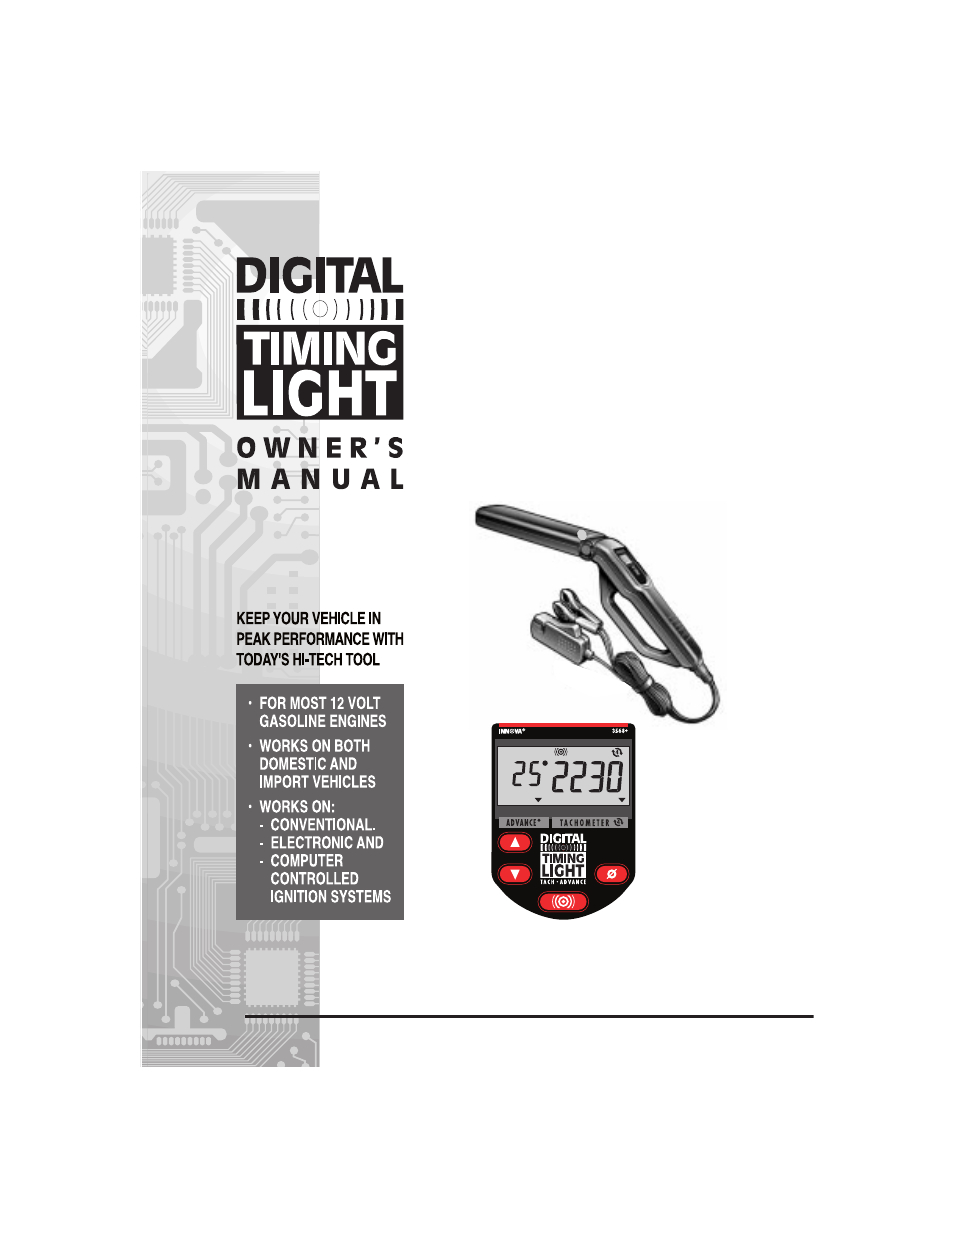 equus 3568 innova digital timing light user manual 12. Black Bedroom Furniture Sets. Home Design Ideas